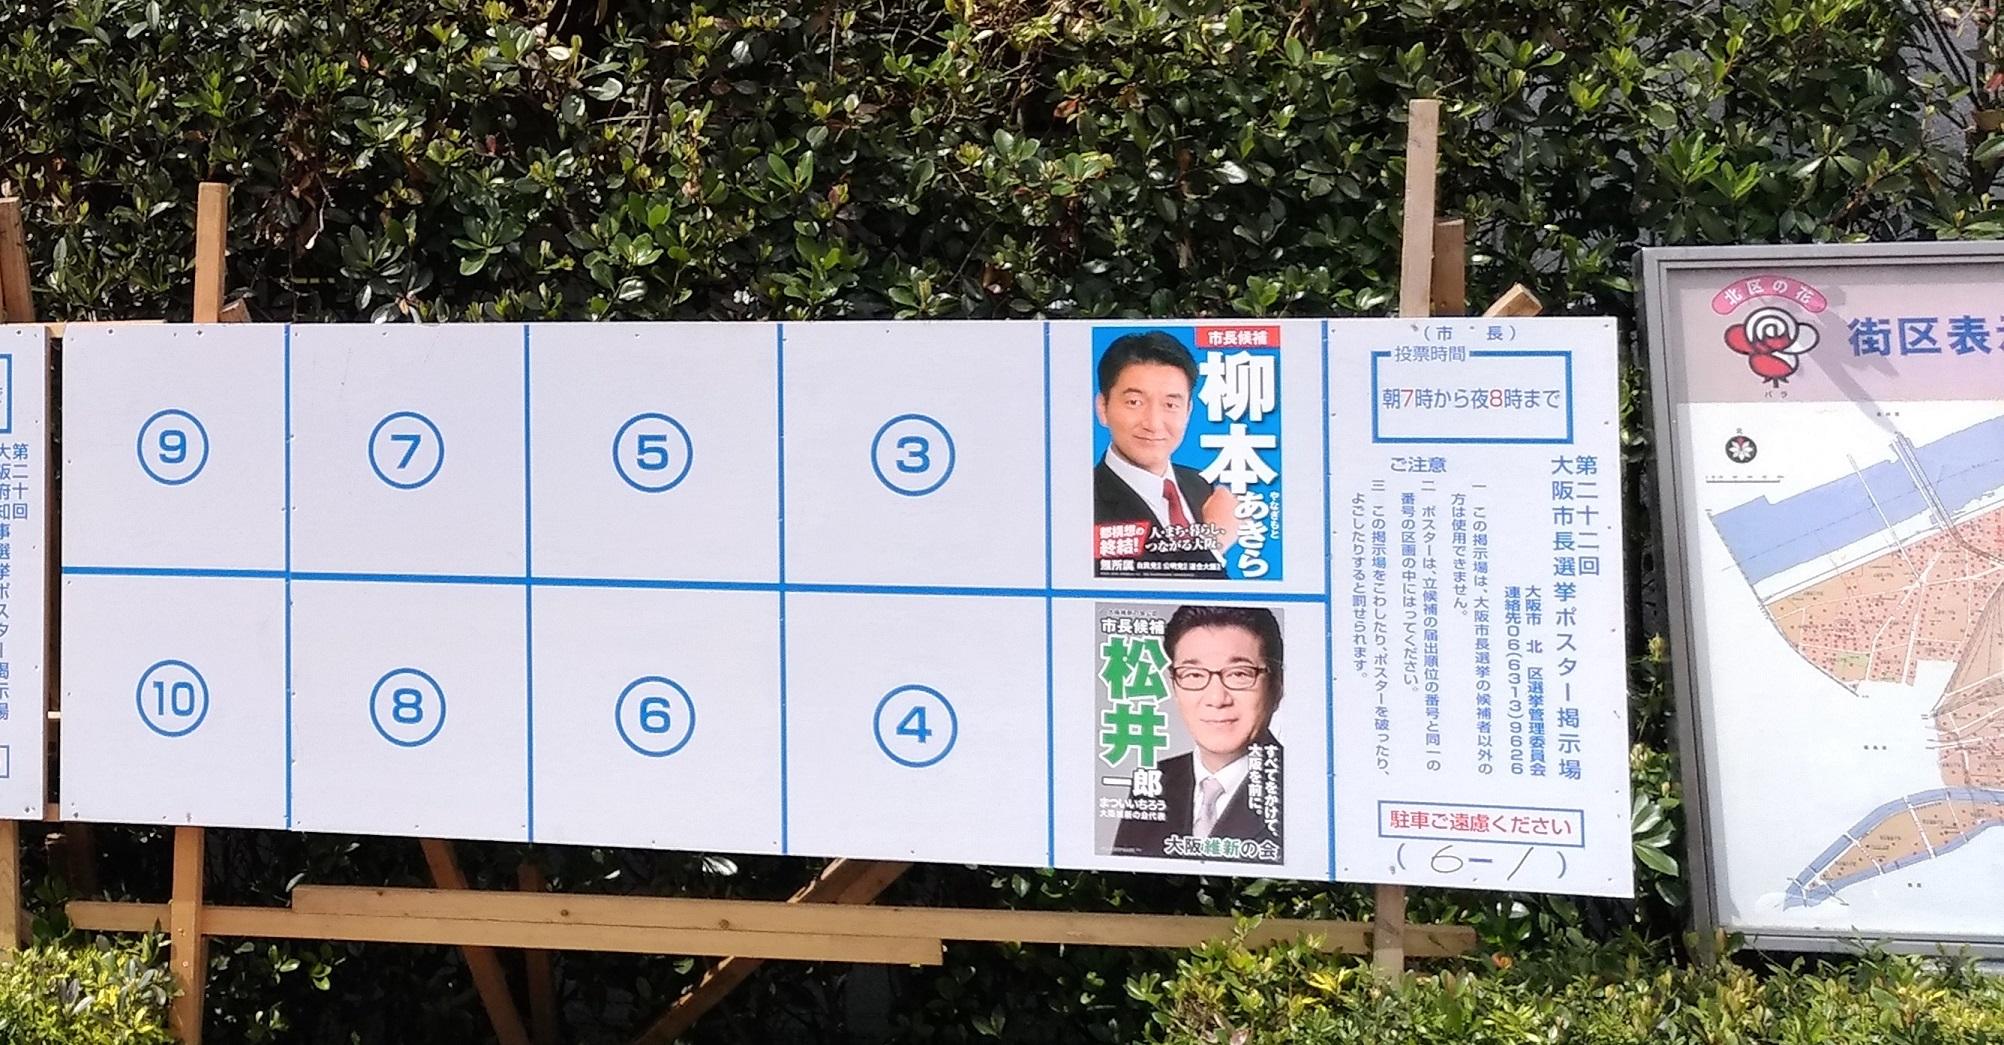 osaka_kijitumae_tohyo2019_1.jpg